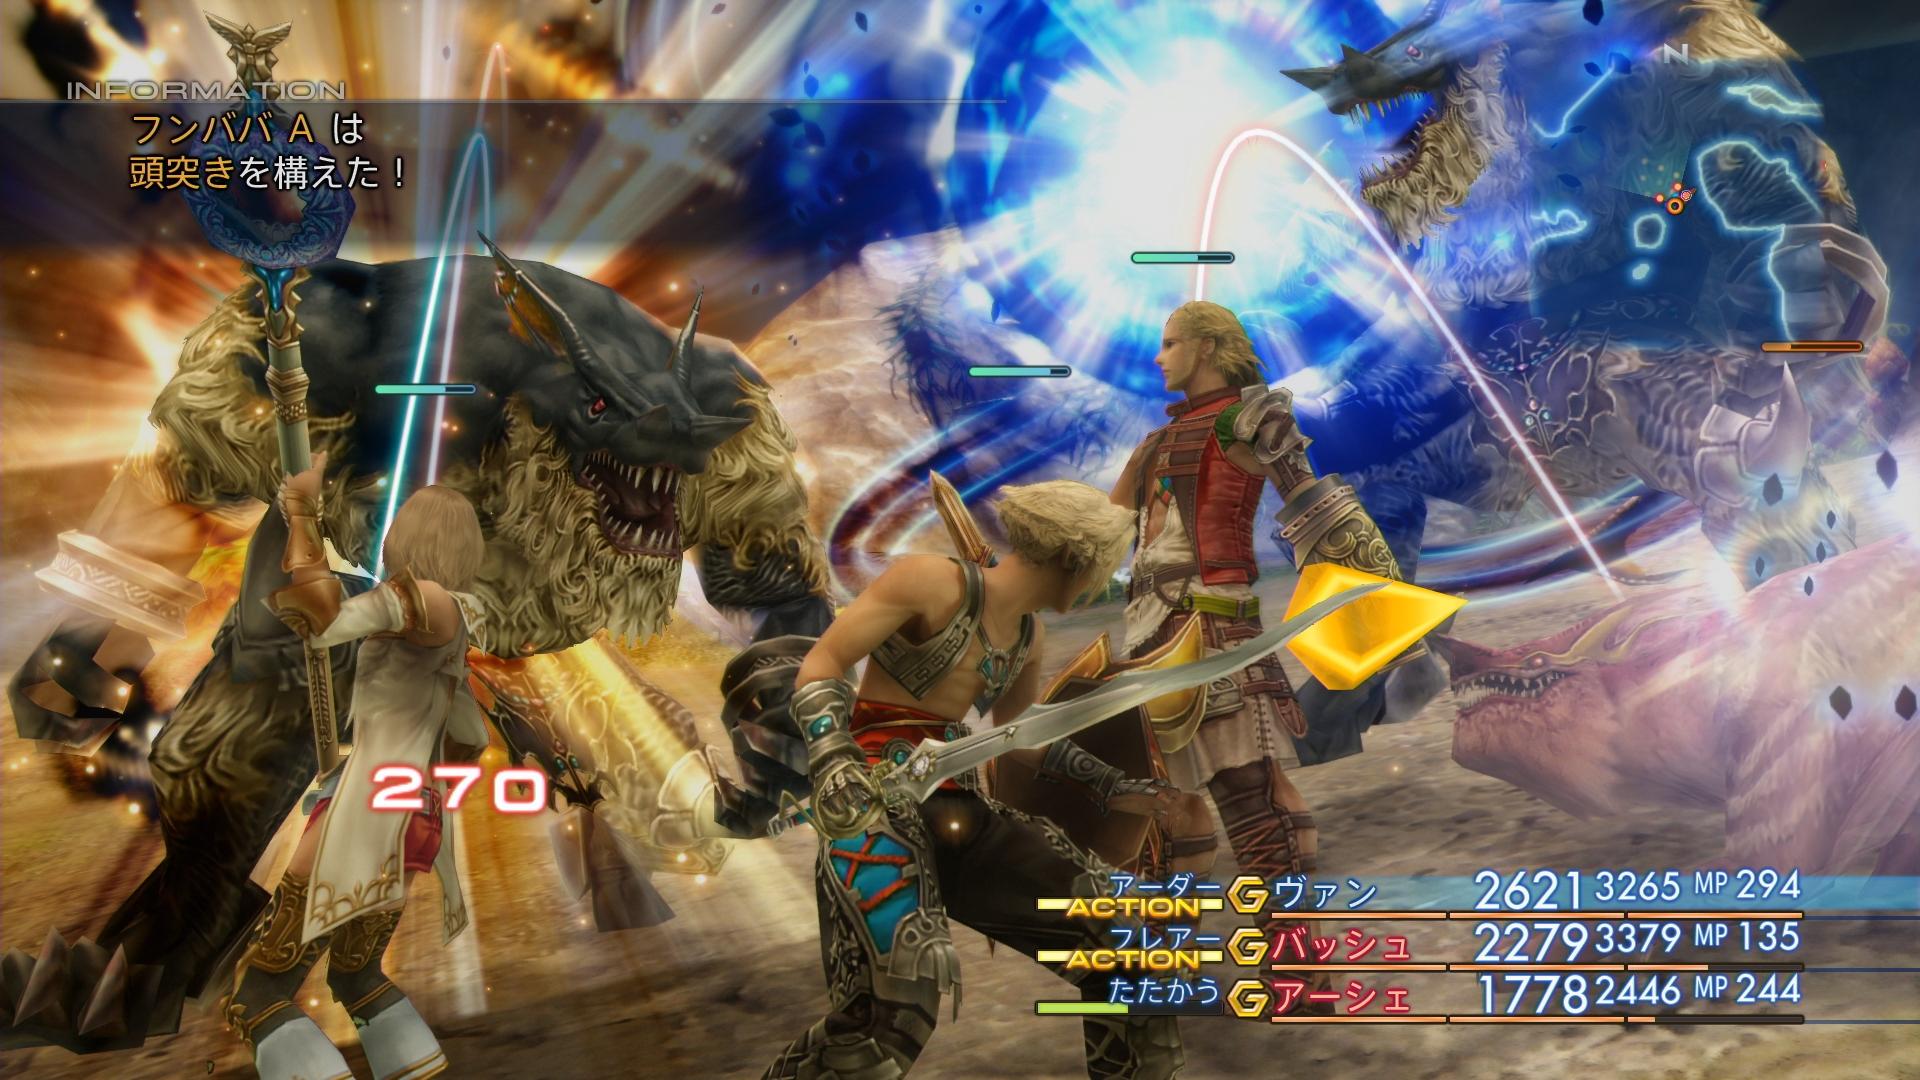 Final Fantasy Xii The Zodiac Age Screen 35